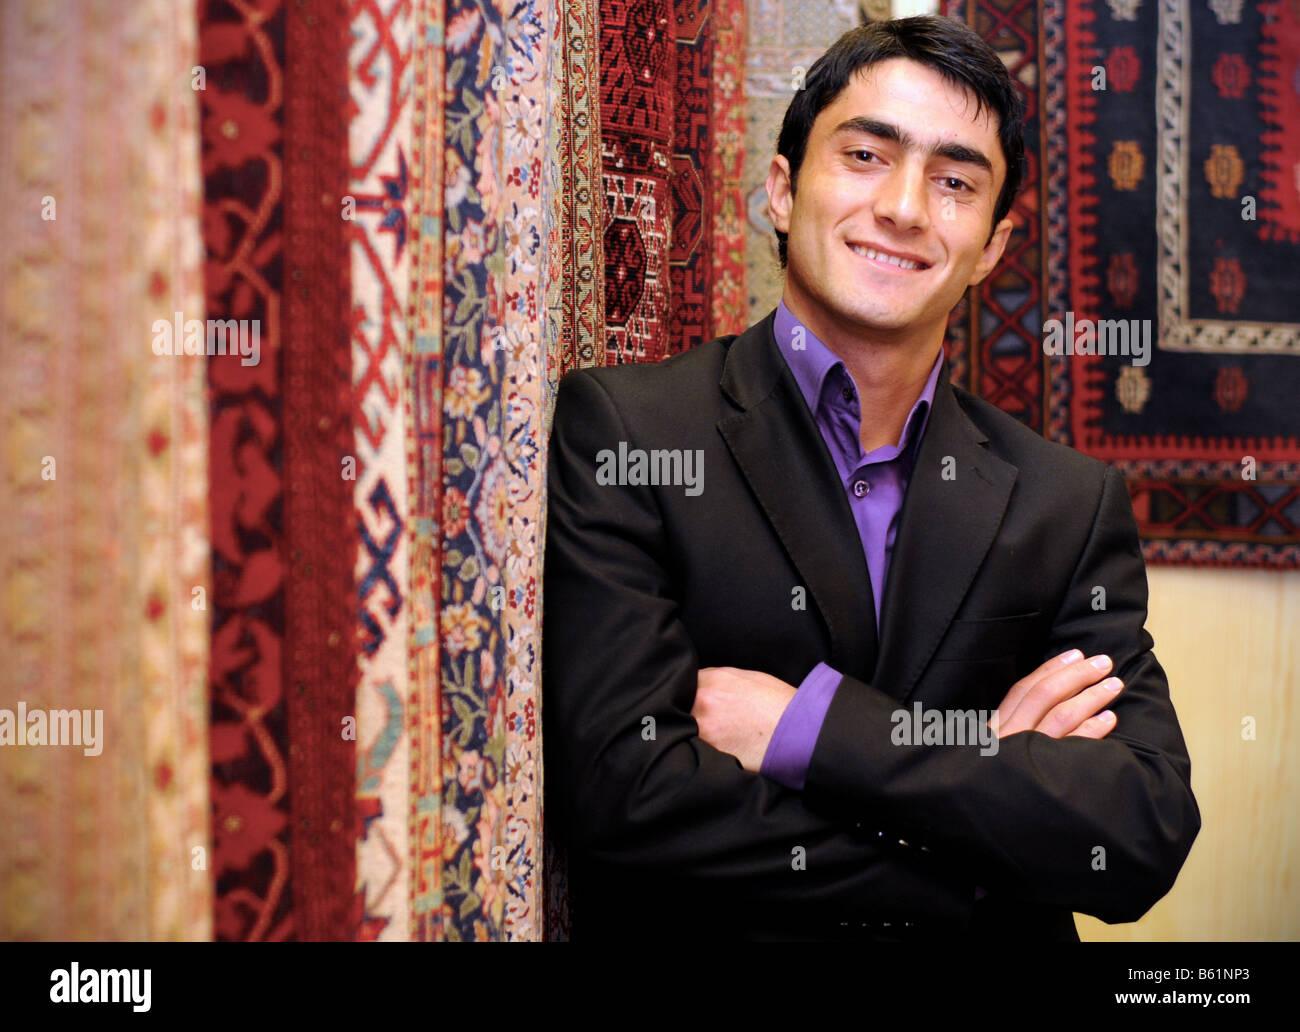 carpet salesman stockfotos carpet salesman bilder alamy. Black Bedroom Furniture Sets. Home Design Ideas